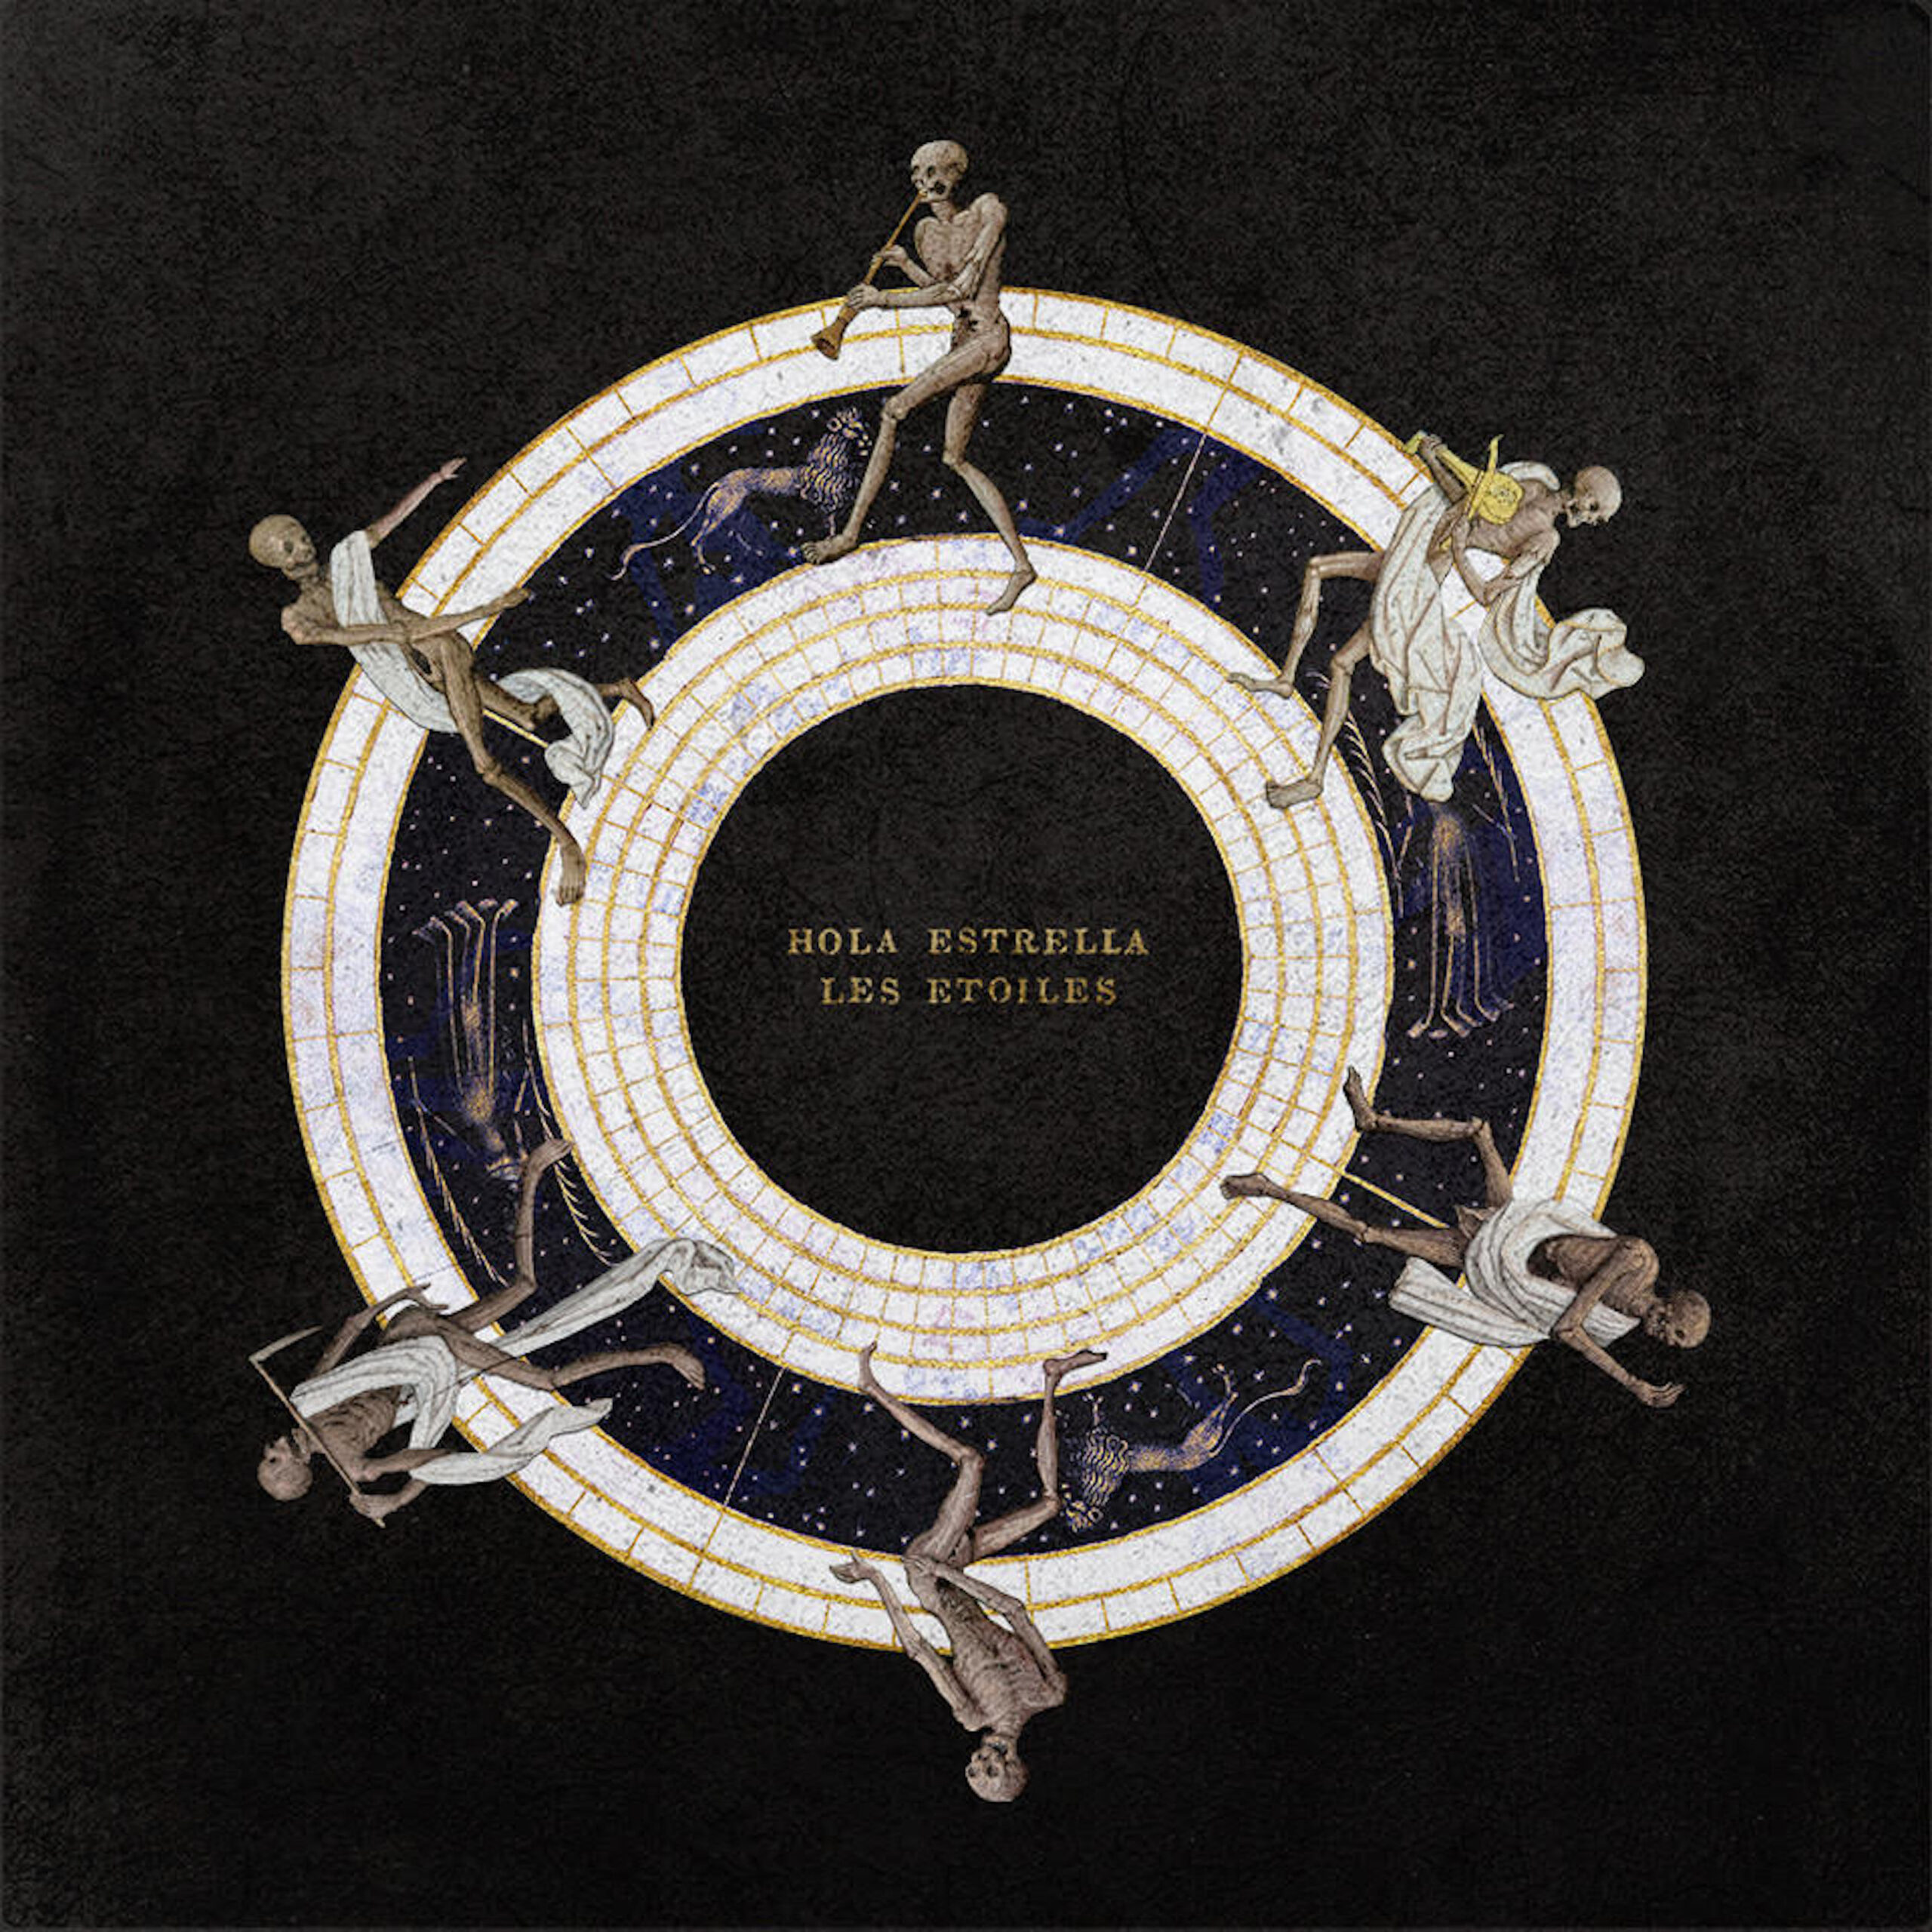 PREMIERE: Hola Estrella Feat. AGD - Les Etoiles (Velax Cosmic Dust Remix) [Nein Records]